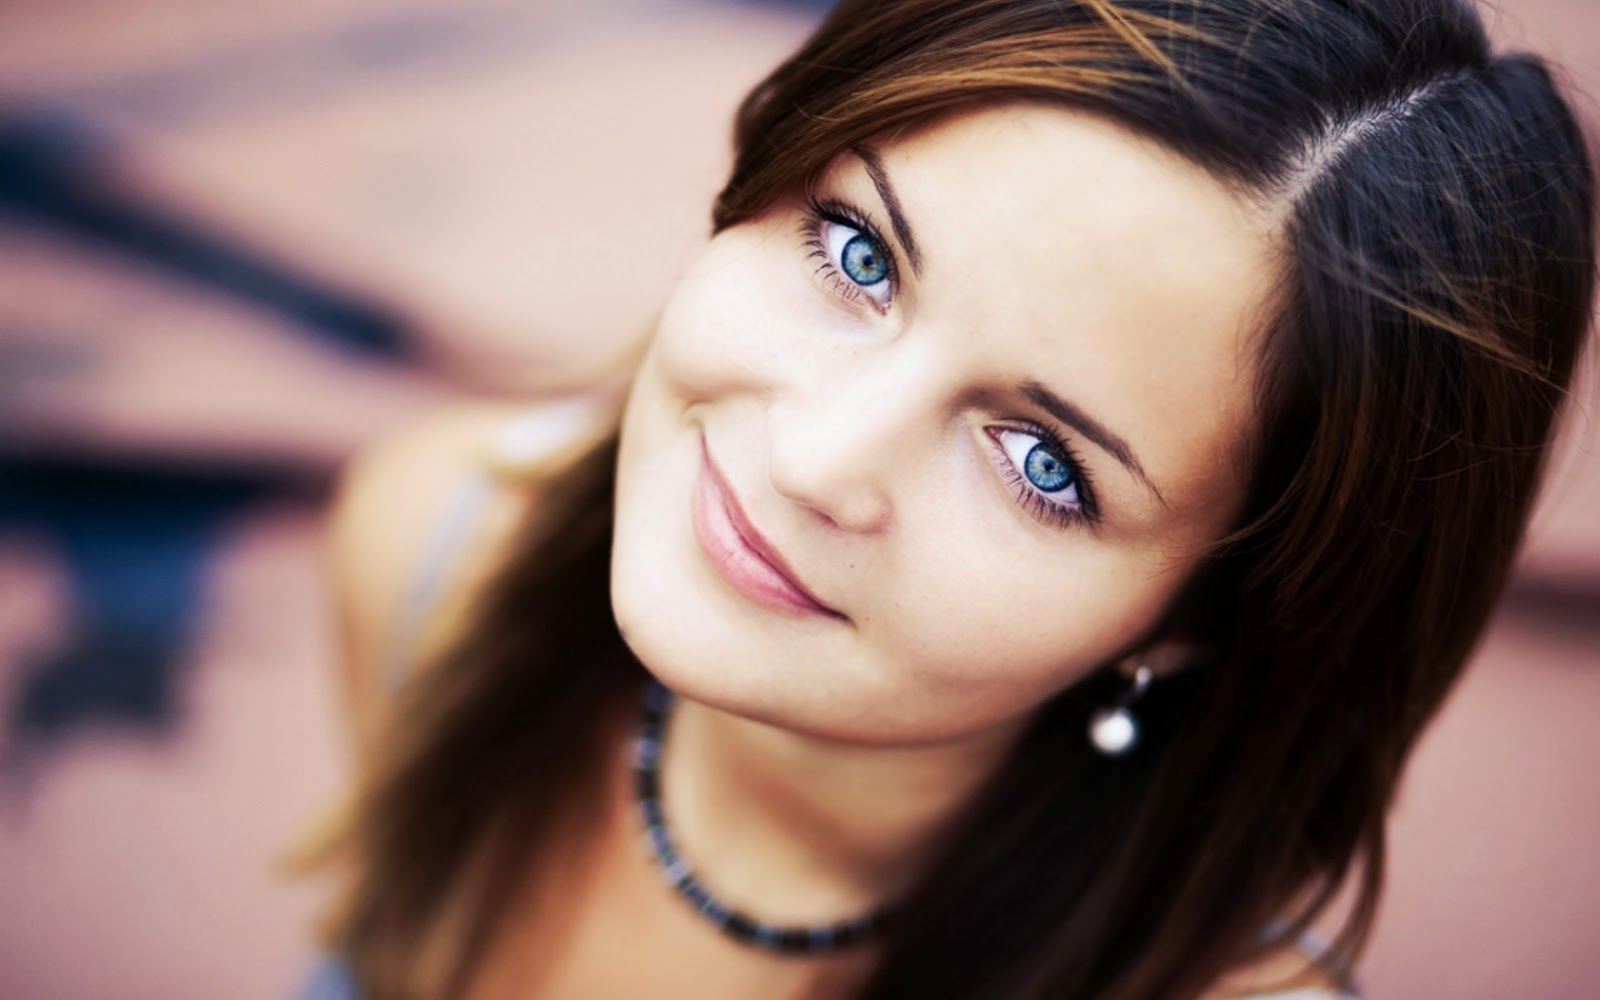 5b6609c2e1015 صور بنات جميلة 2014 Pictures of beautiful girls